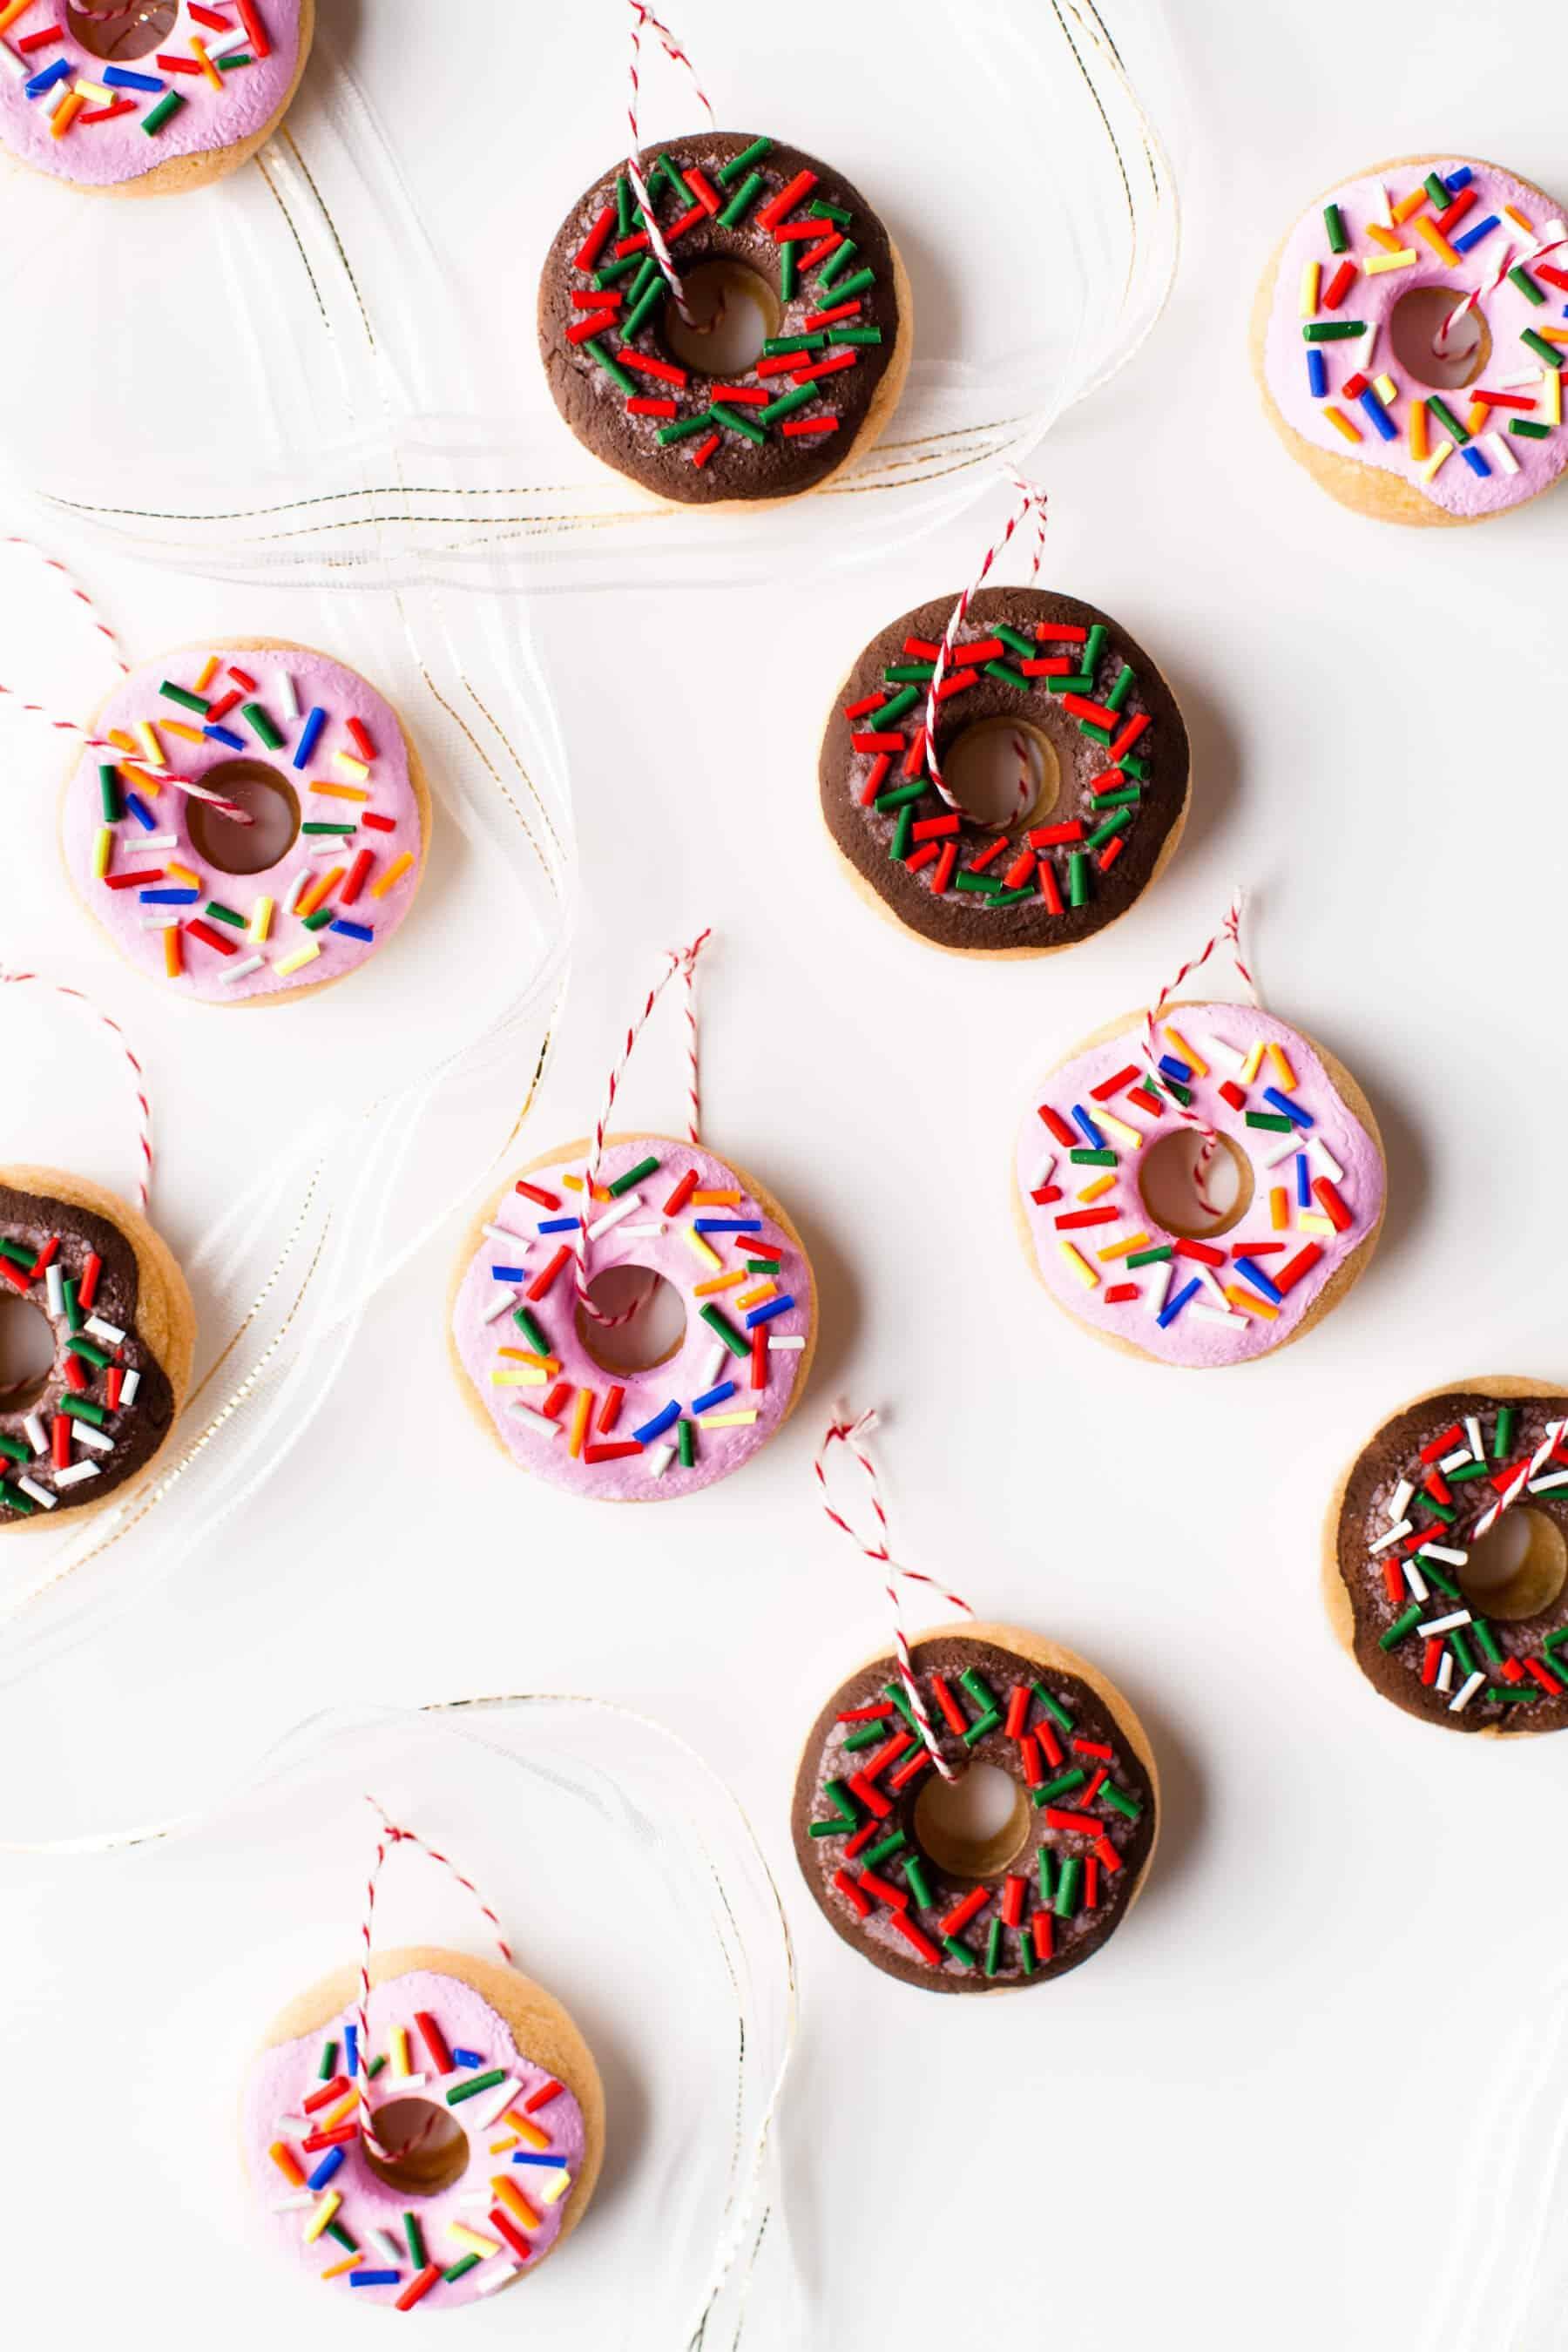 DIY Salt Dough Donut Ornaments - A